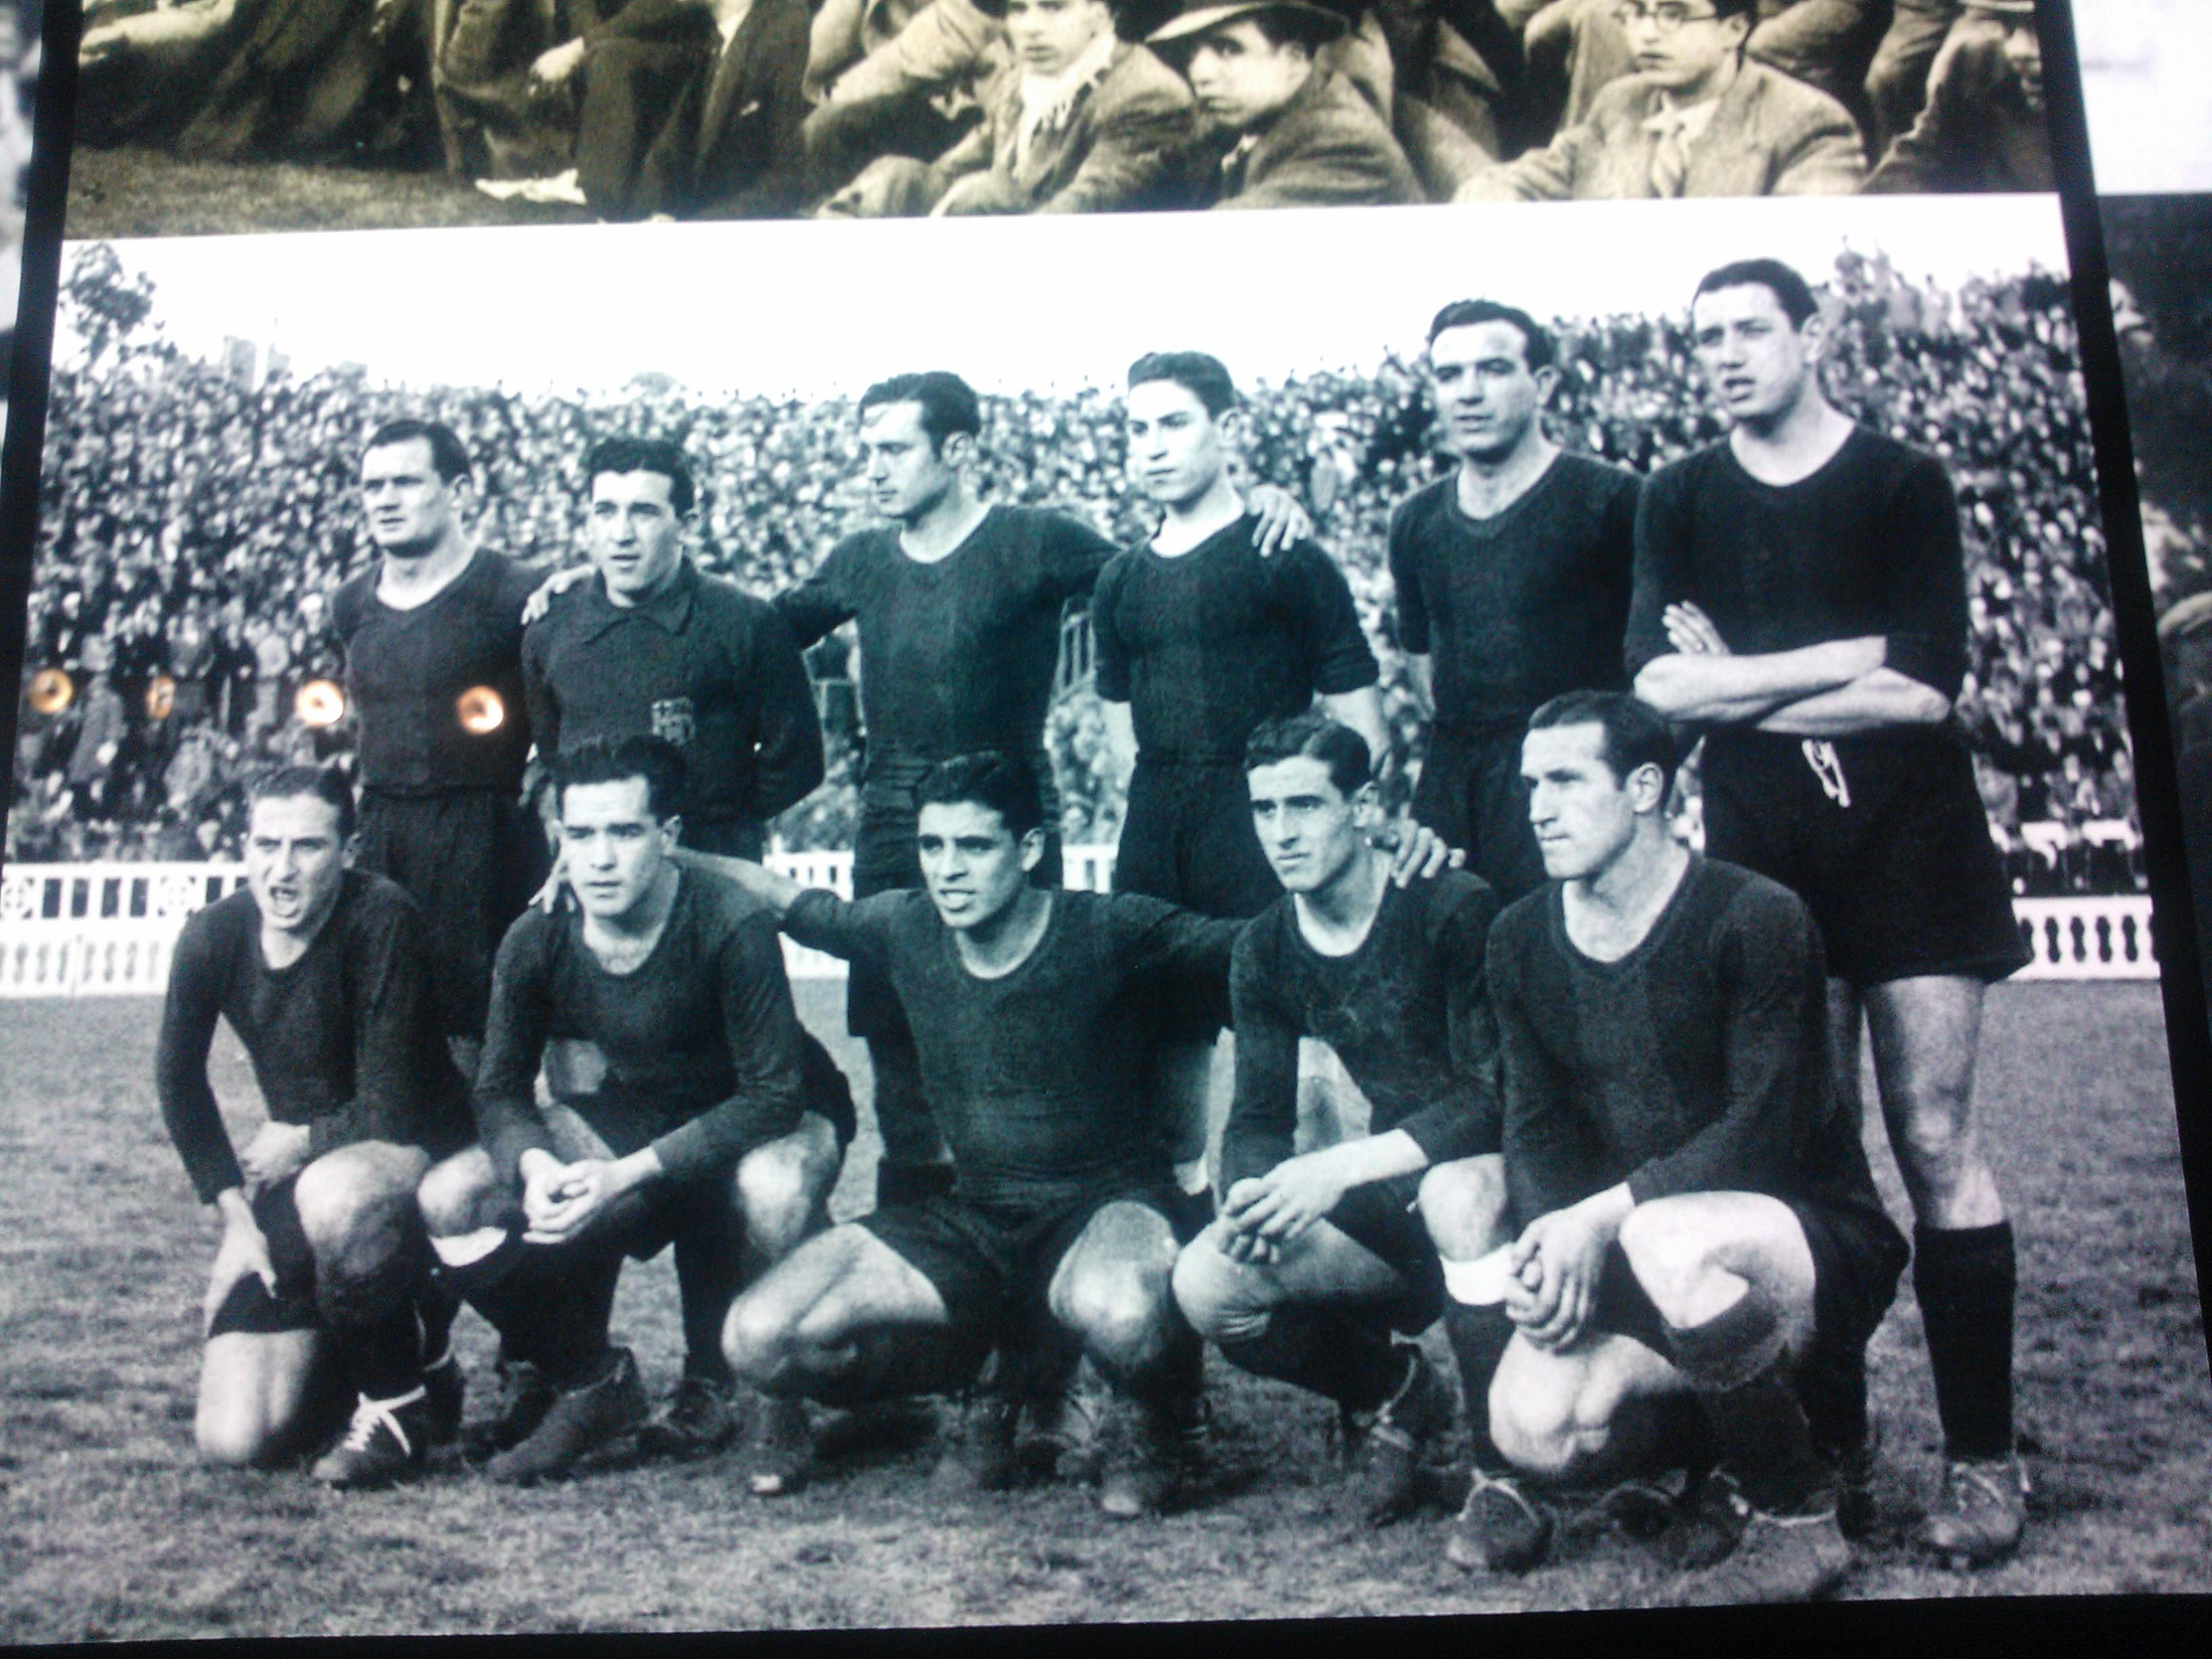 Camp Nou History